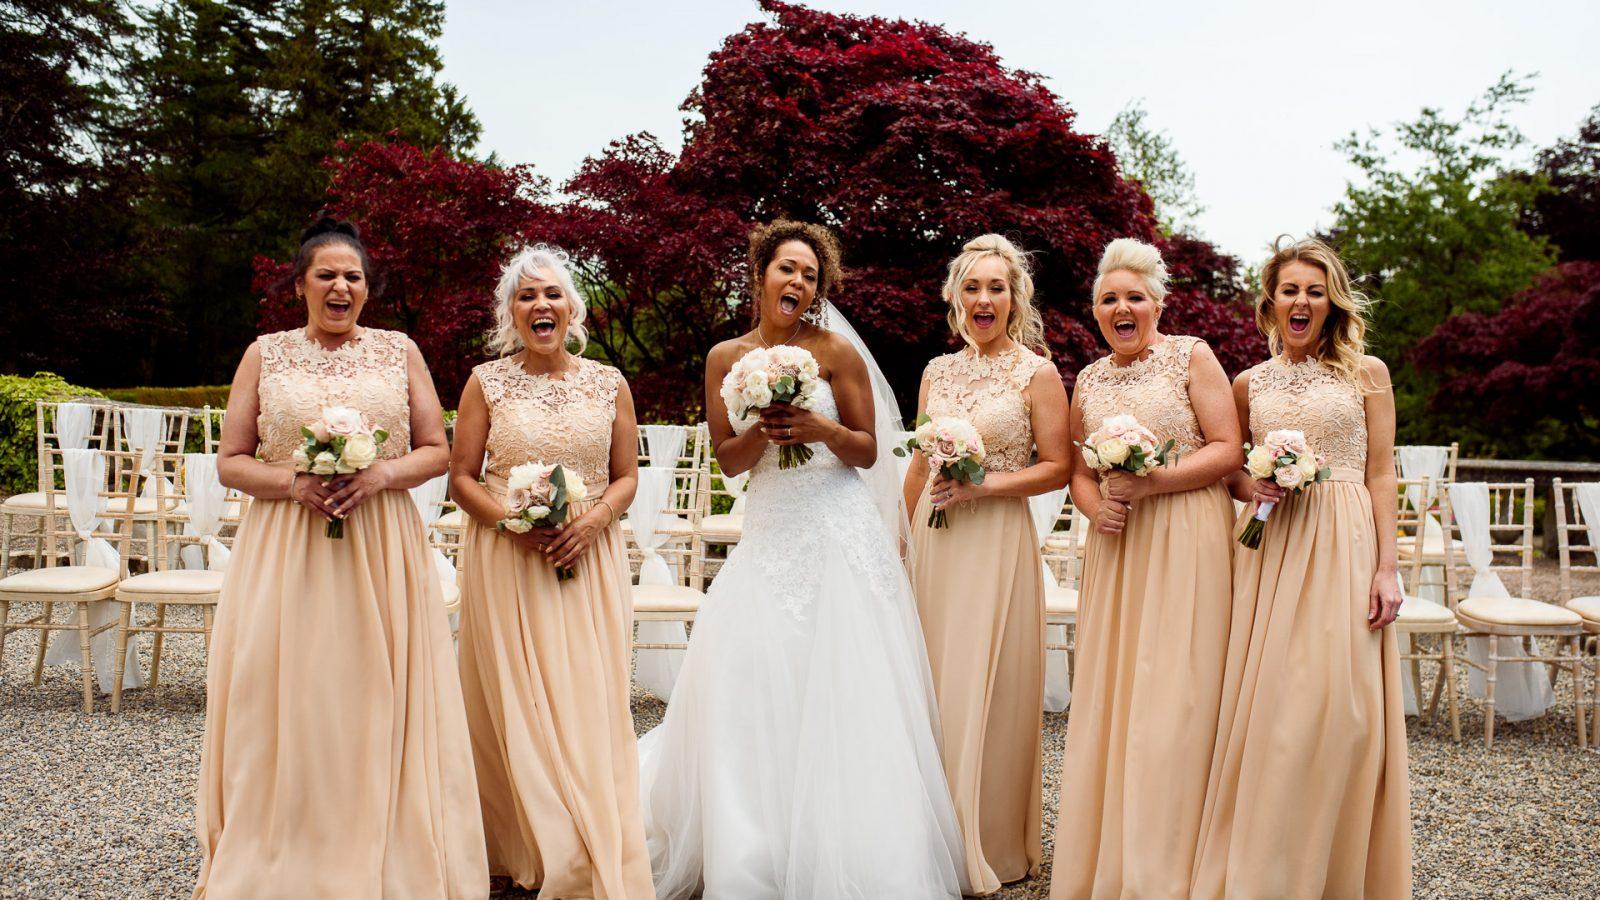 best-wedding-photos-2017-kimberley-and-matthw-bridesmaids-